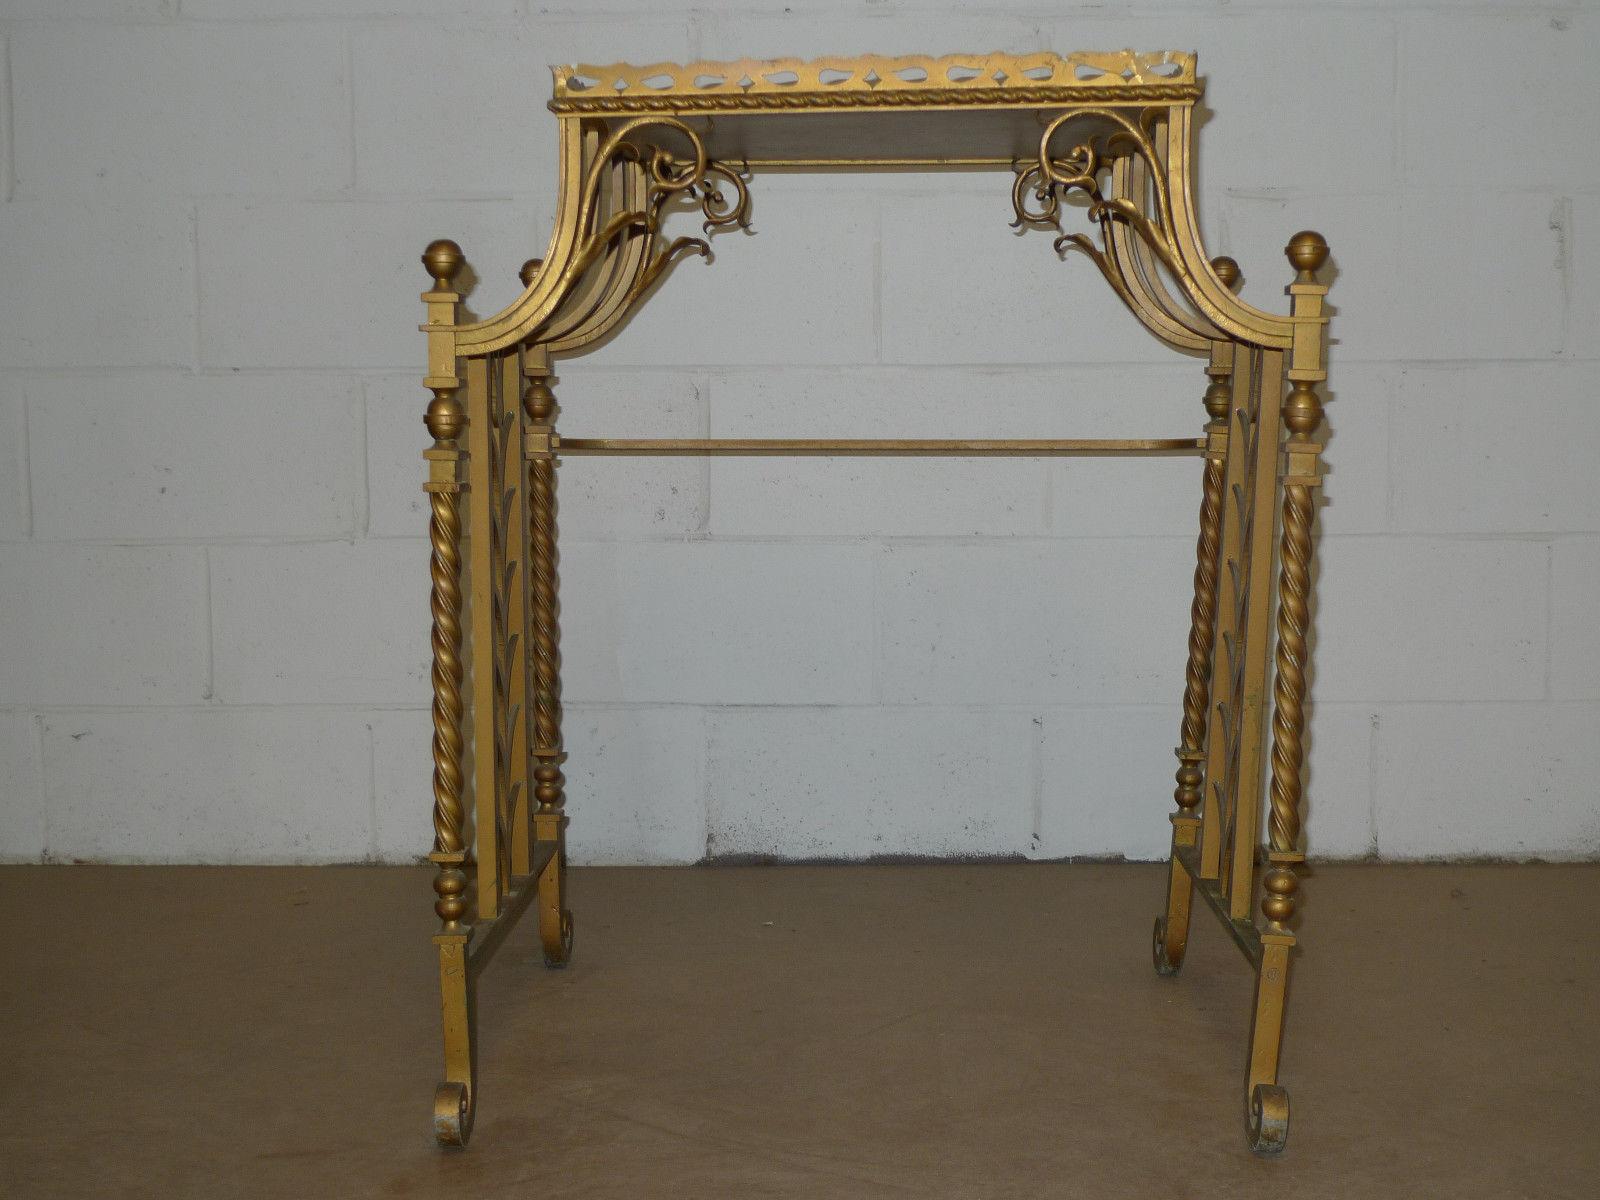 Art deco period gold iron side table art deco period for Art deco period